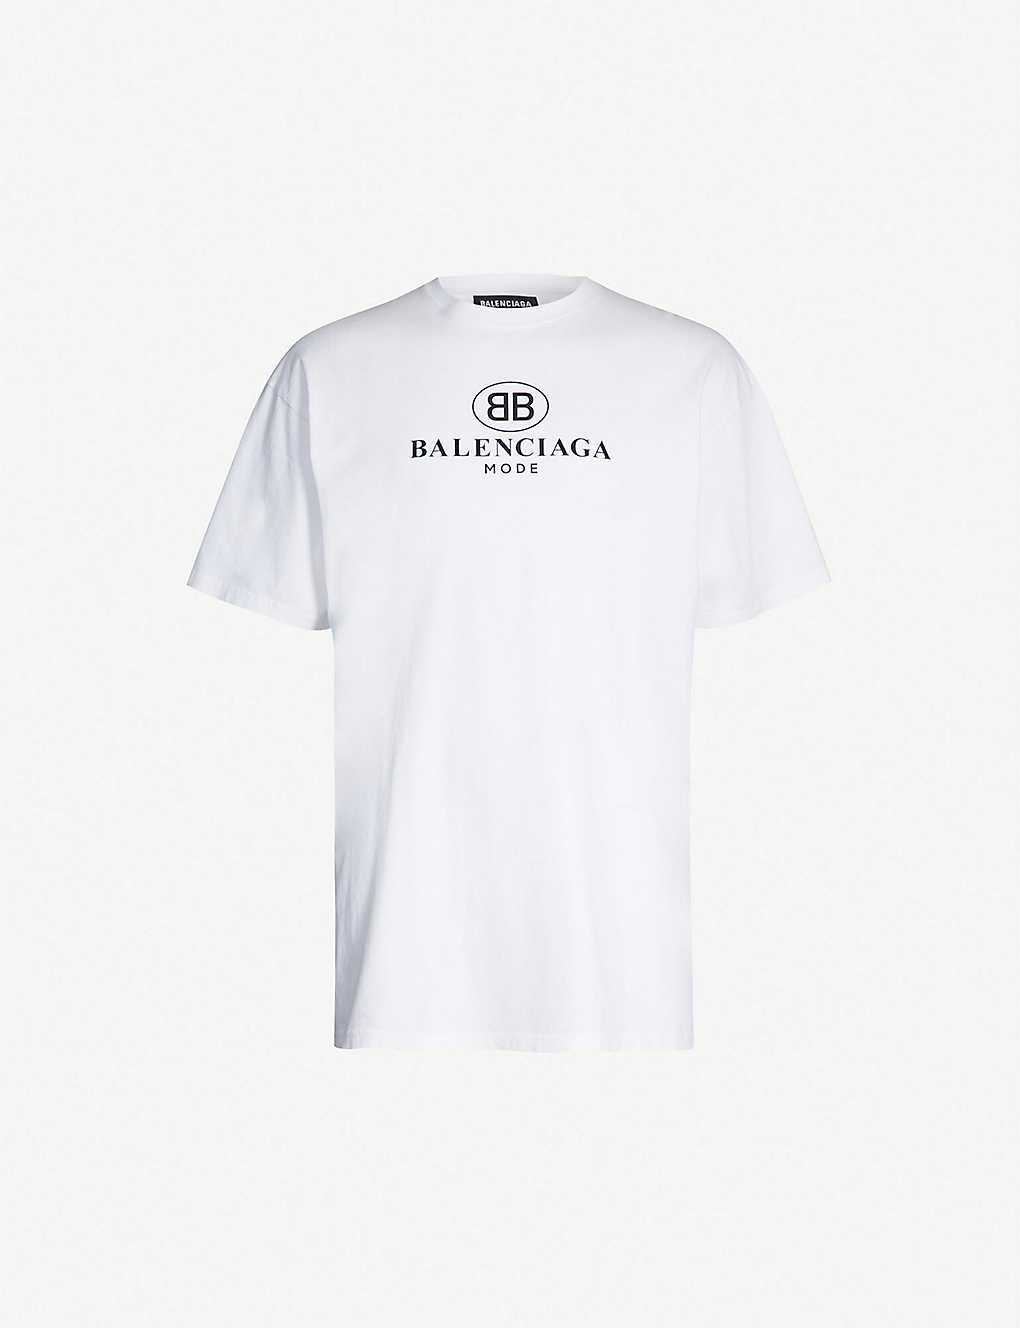 8db36245a BALENCIAGA - Logo-print cotton-jersey T-shirt | Selfridges.comm